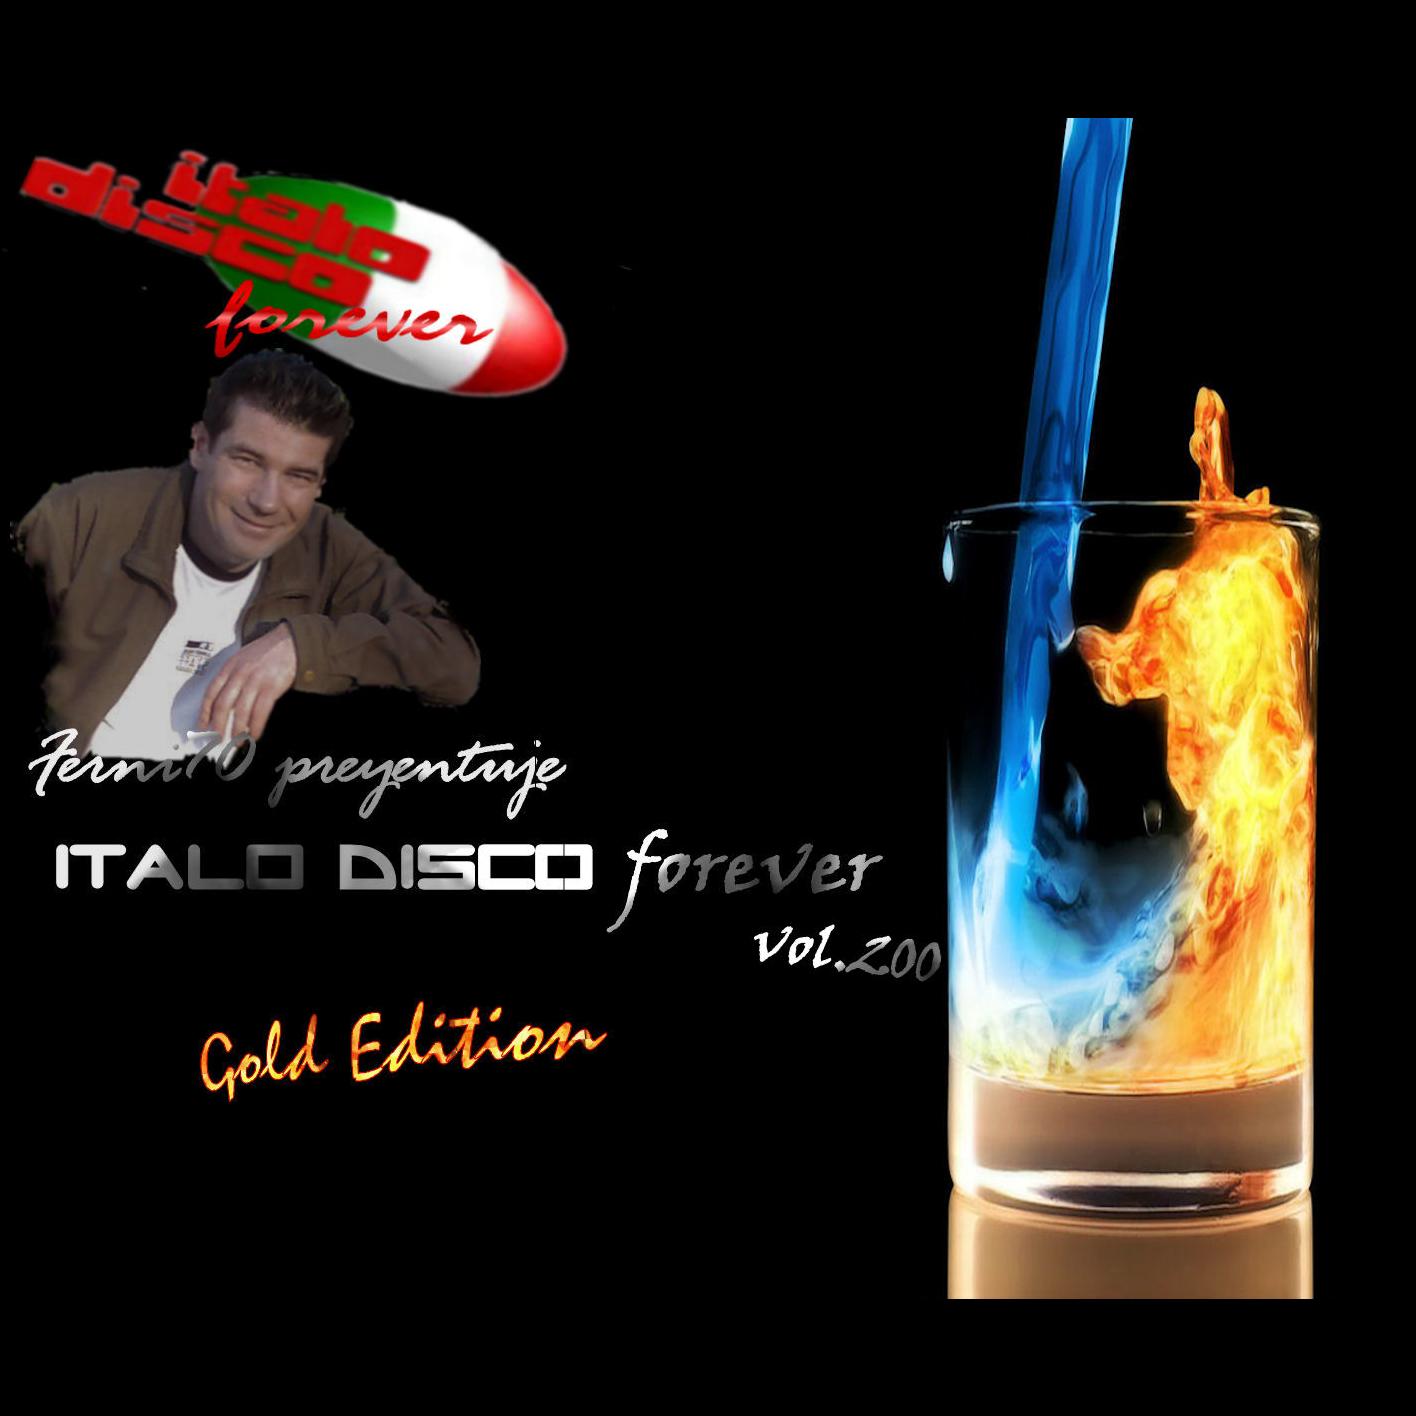 ItaloDiscoForever